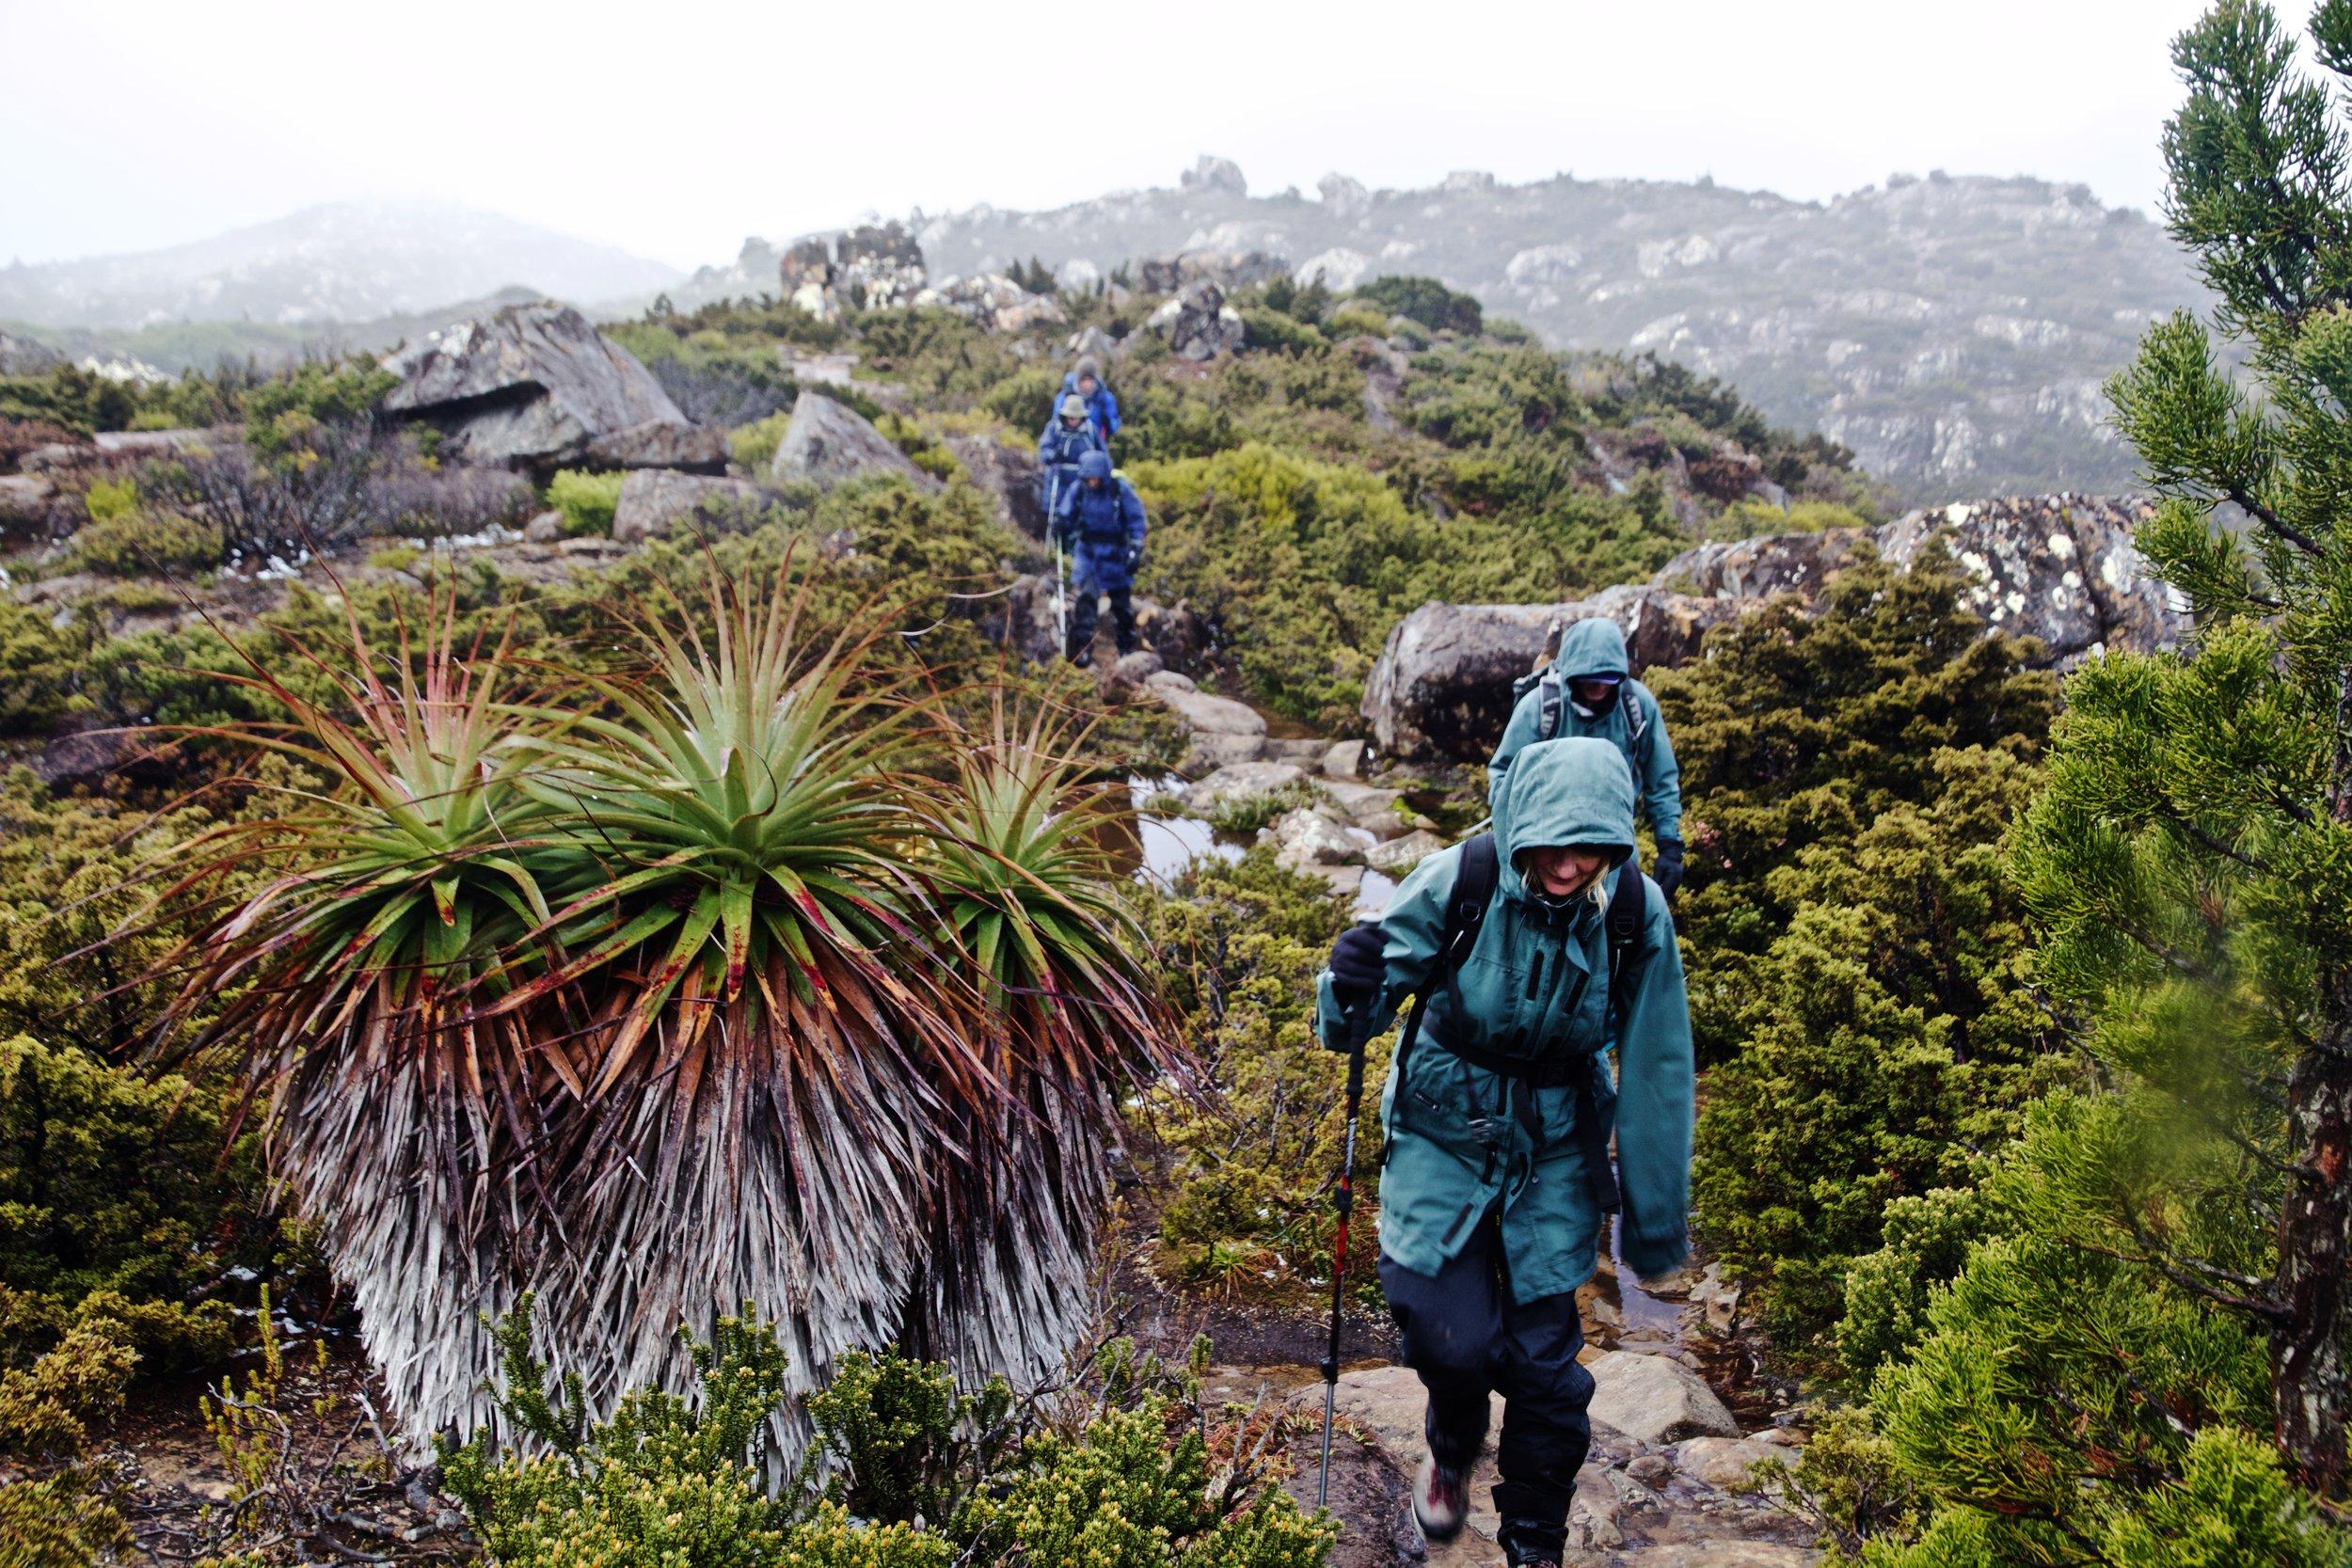 Meandering along Tarn Shelf as part of Wild Pedder's Southwest Tasmania tours.